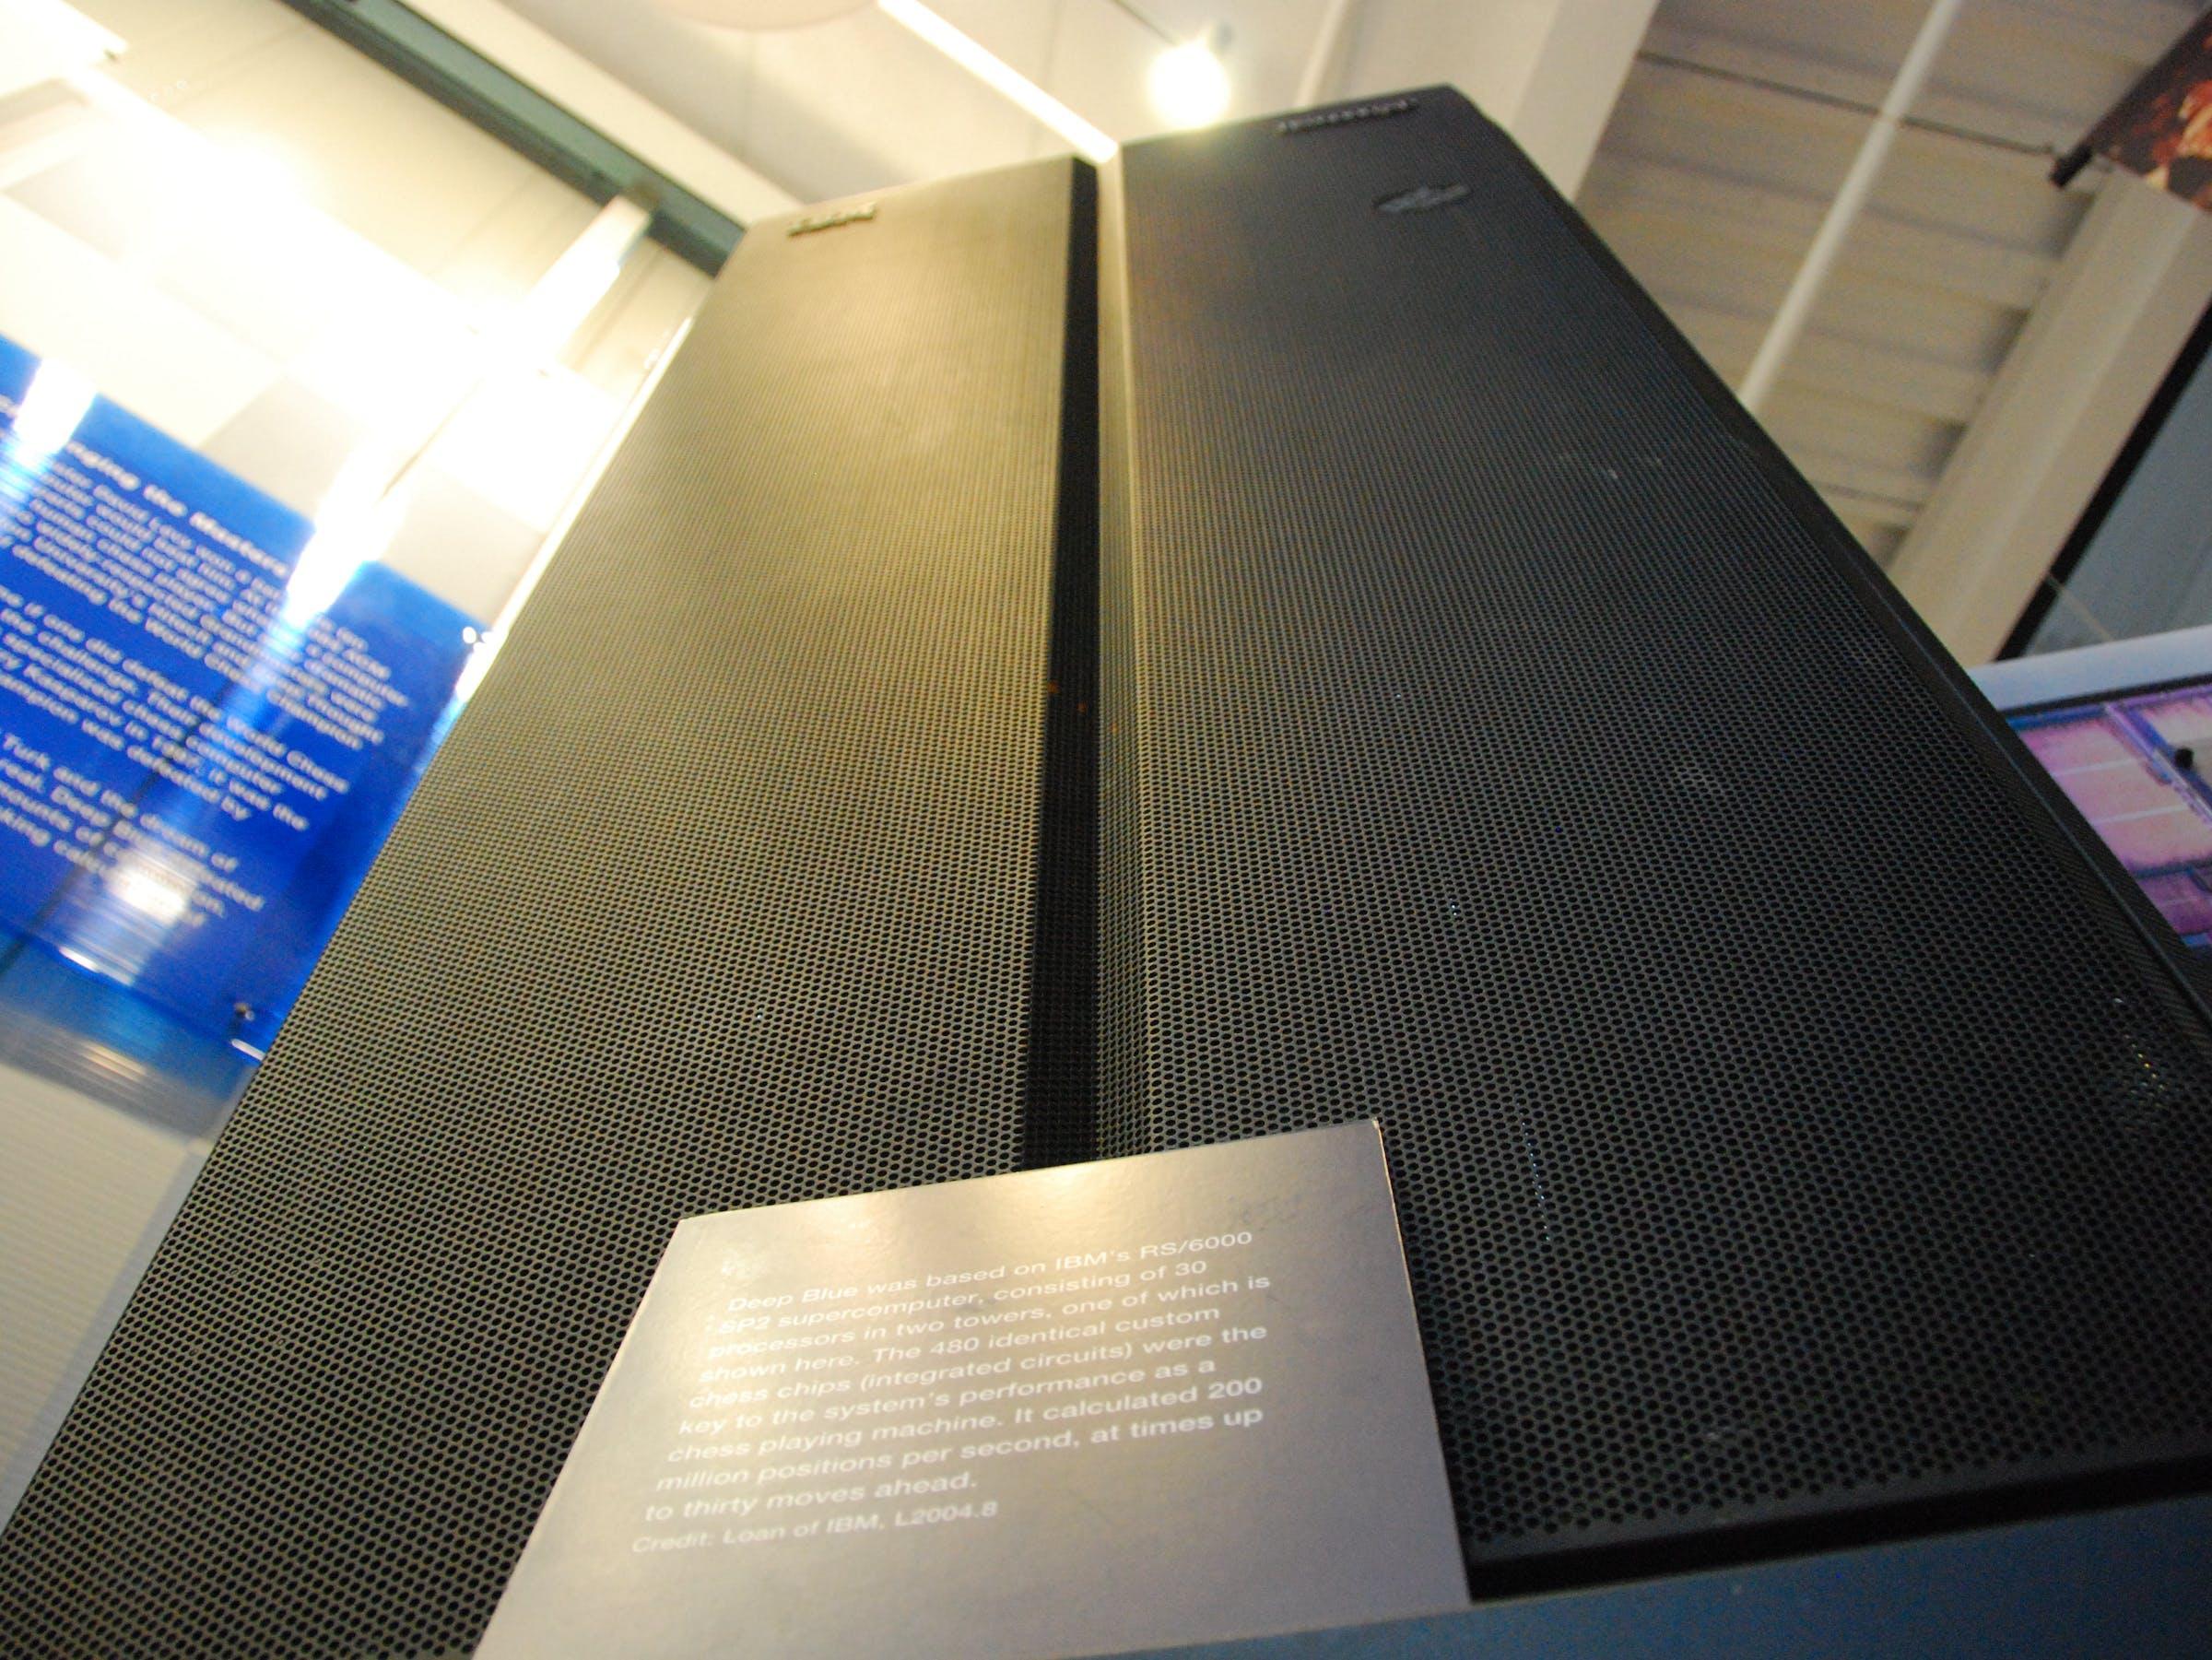 IBM Deep Blue